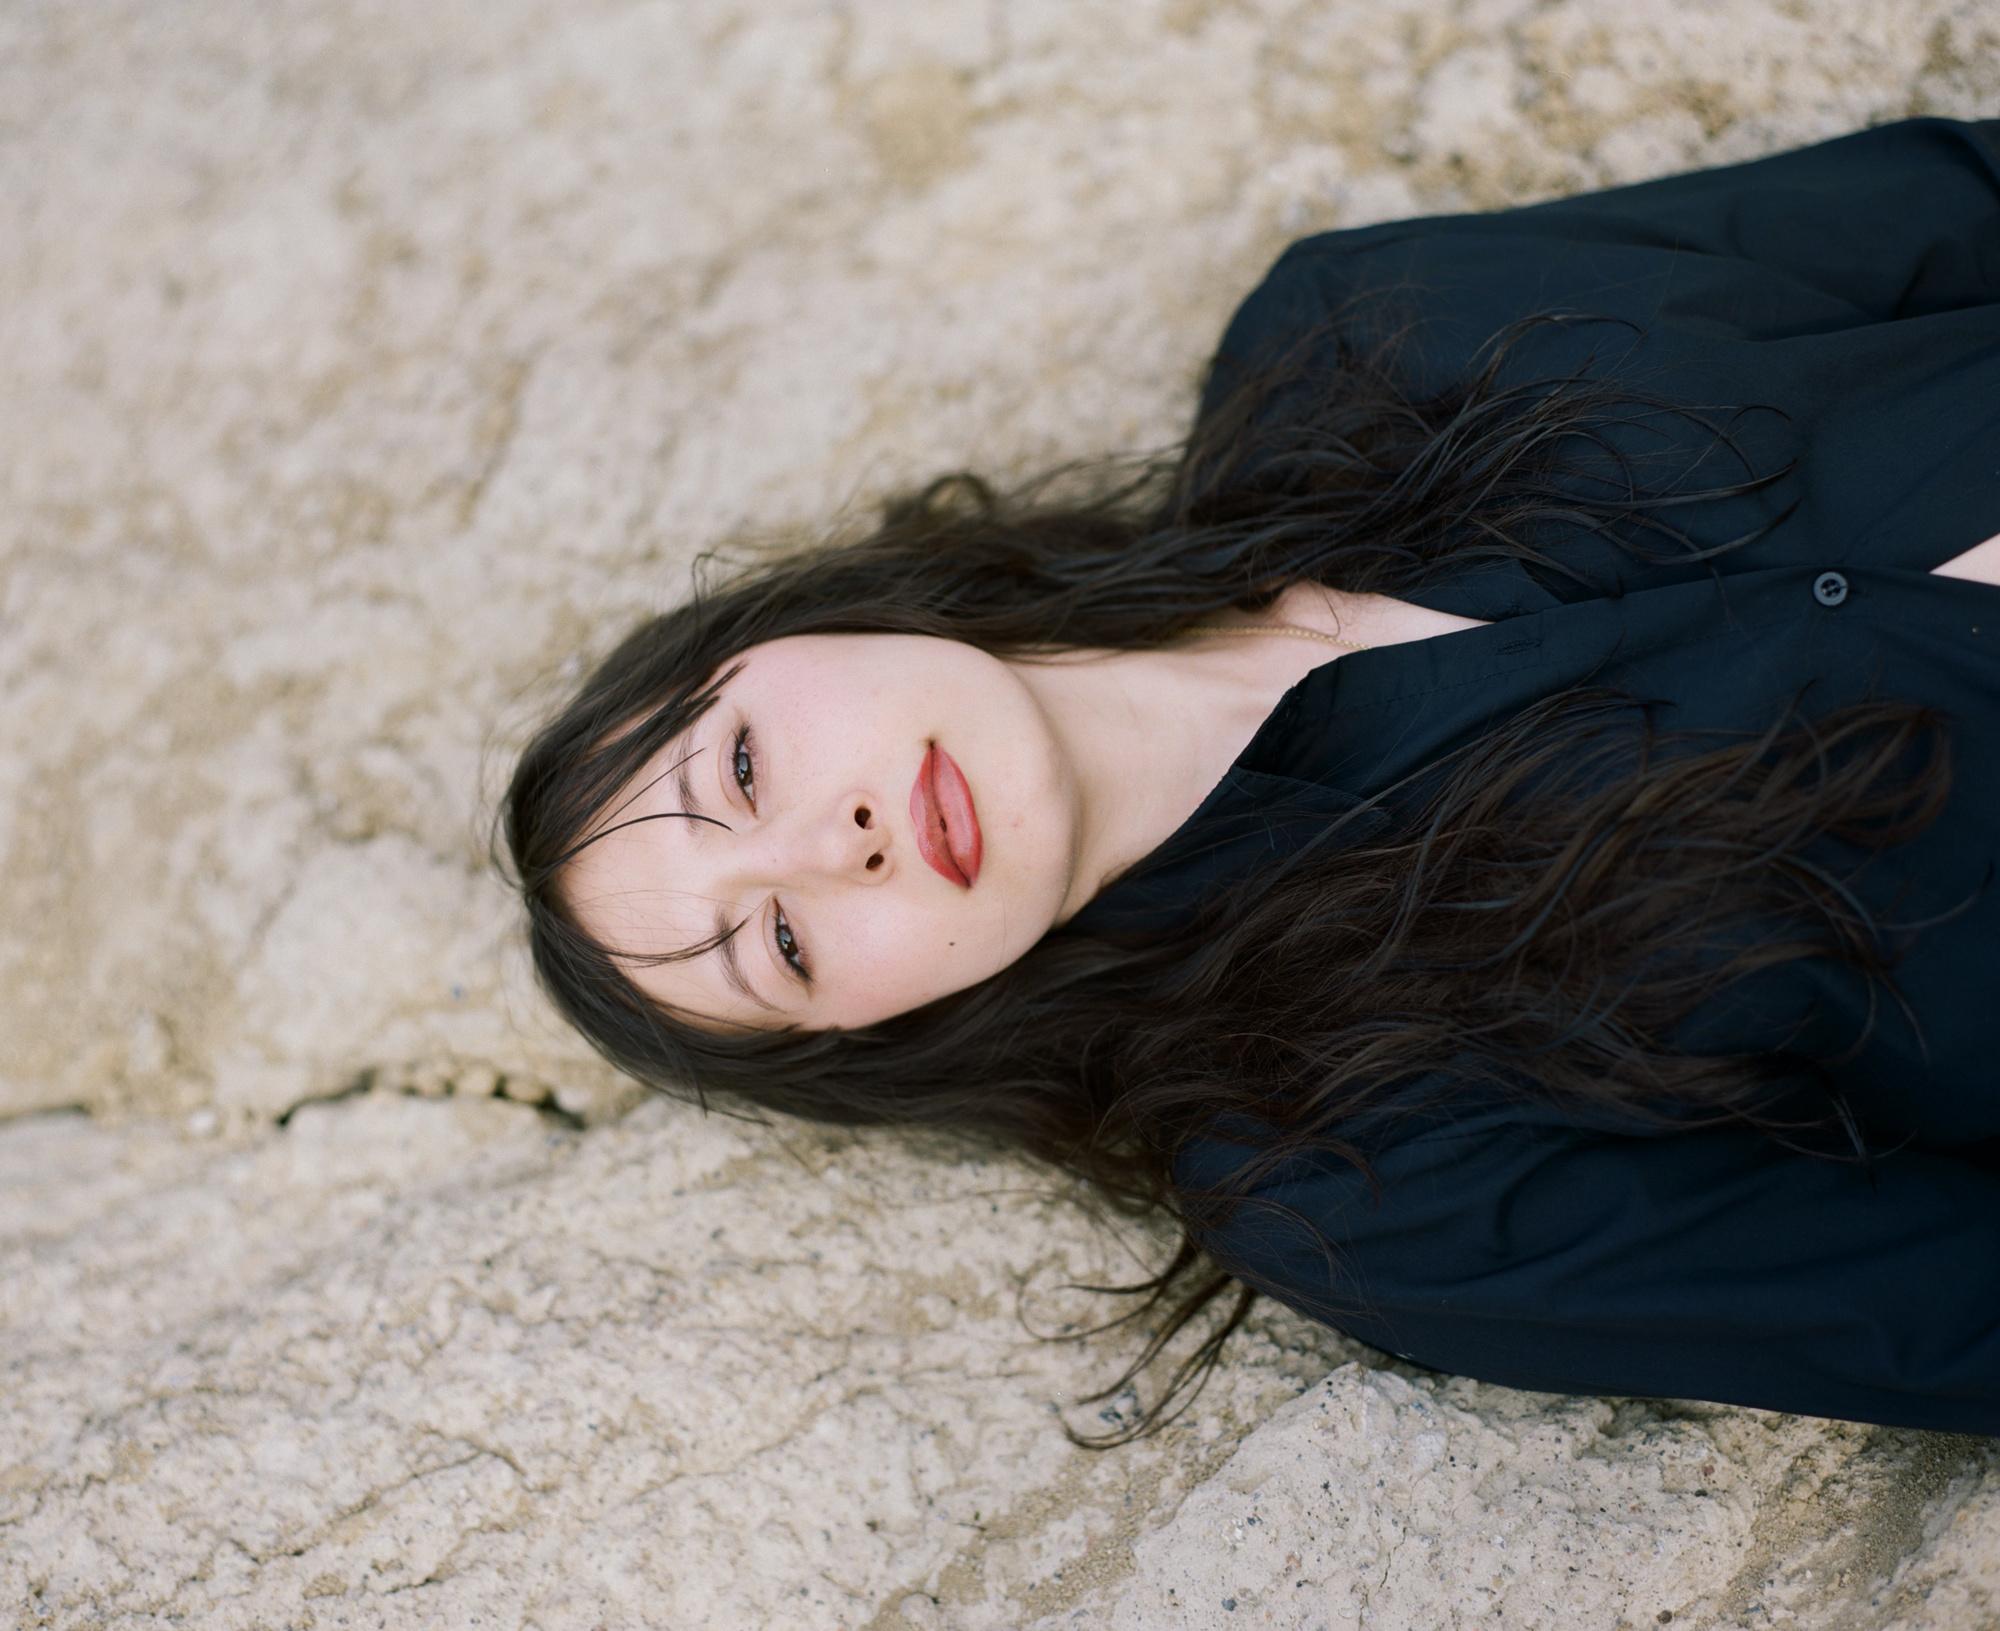 Chibi Ichigo door Yaqine Hamzaoui, Yaqine Hamzaoui